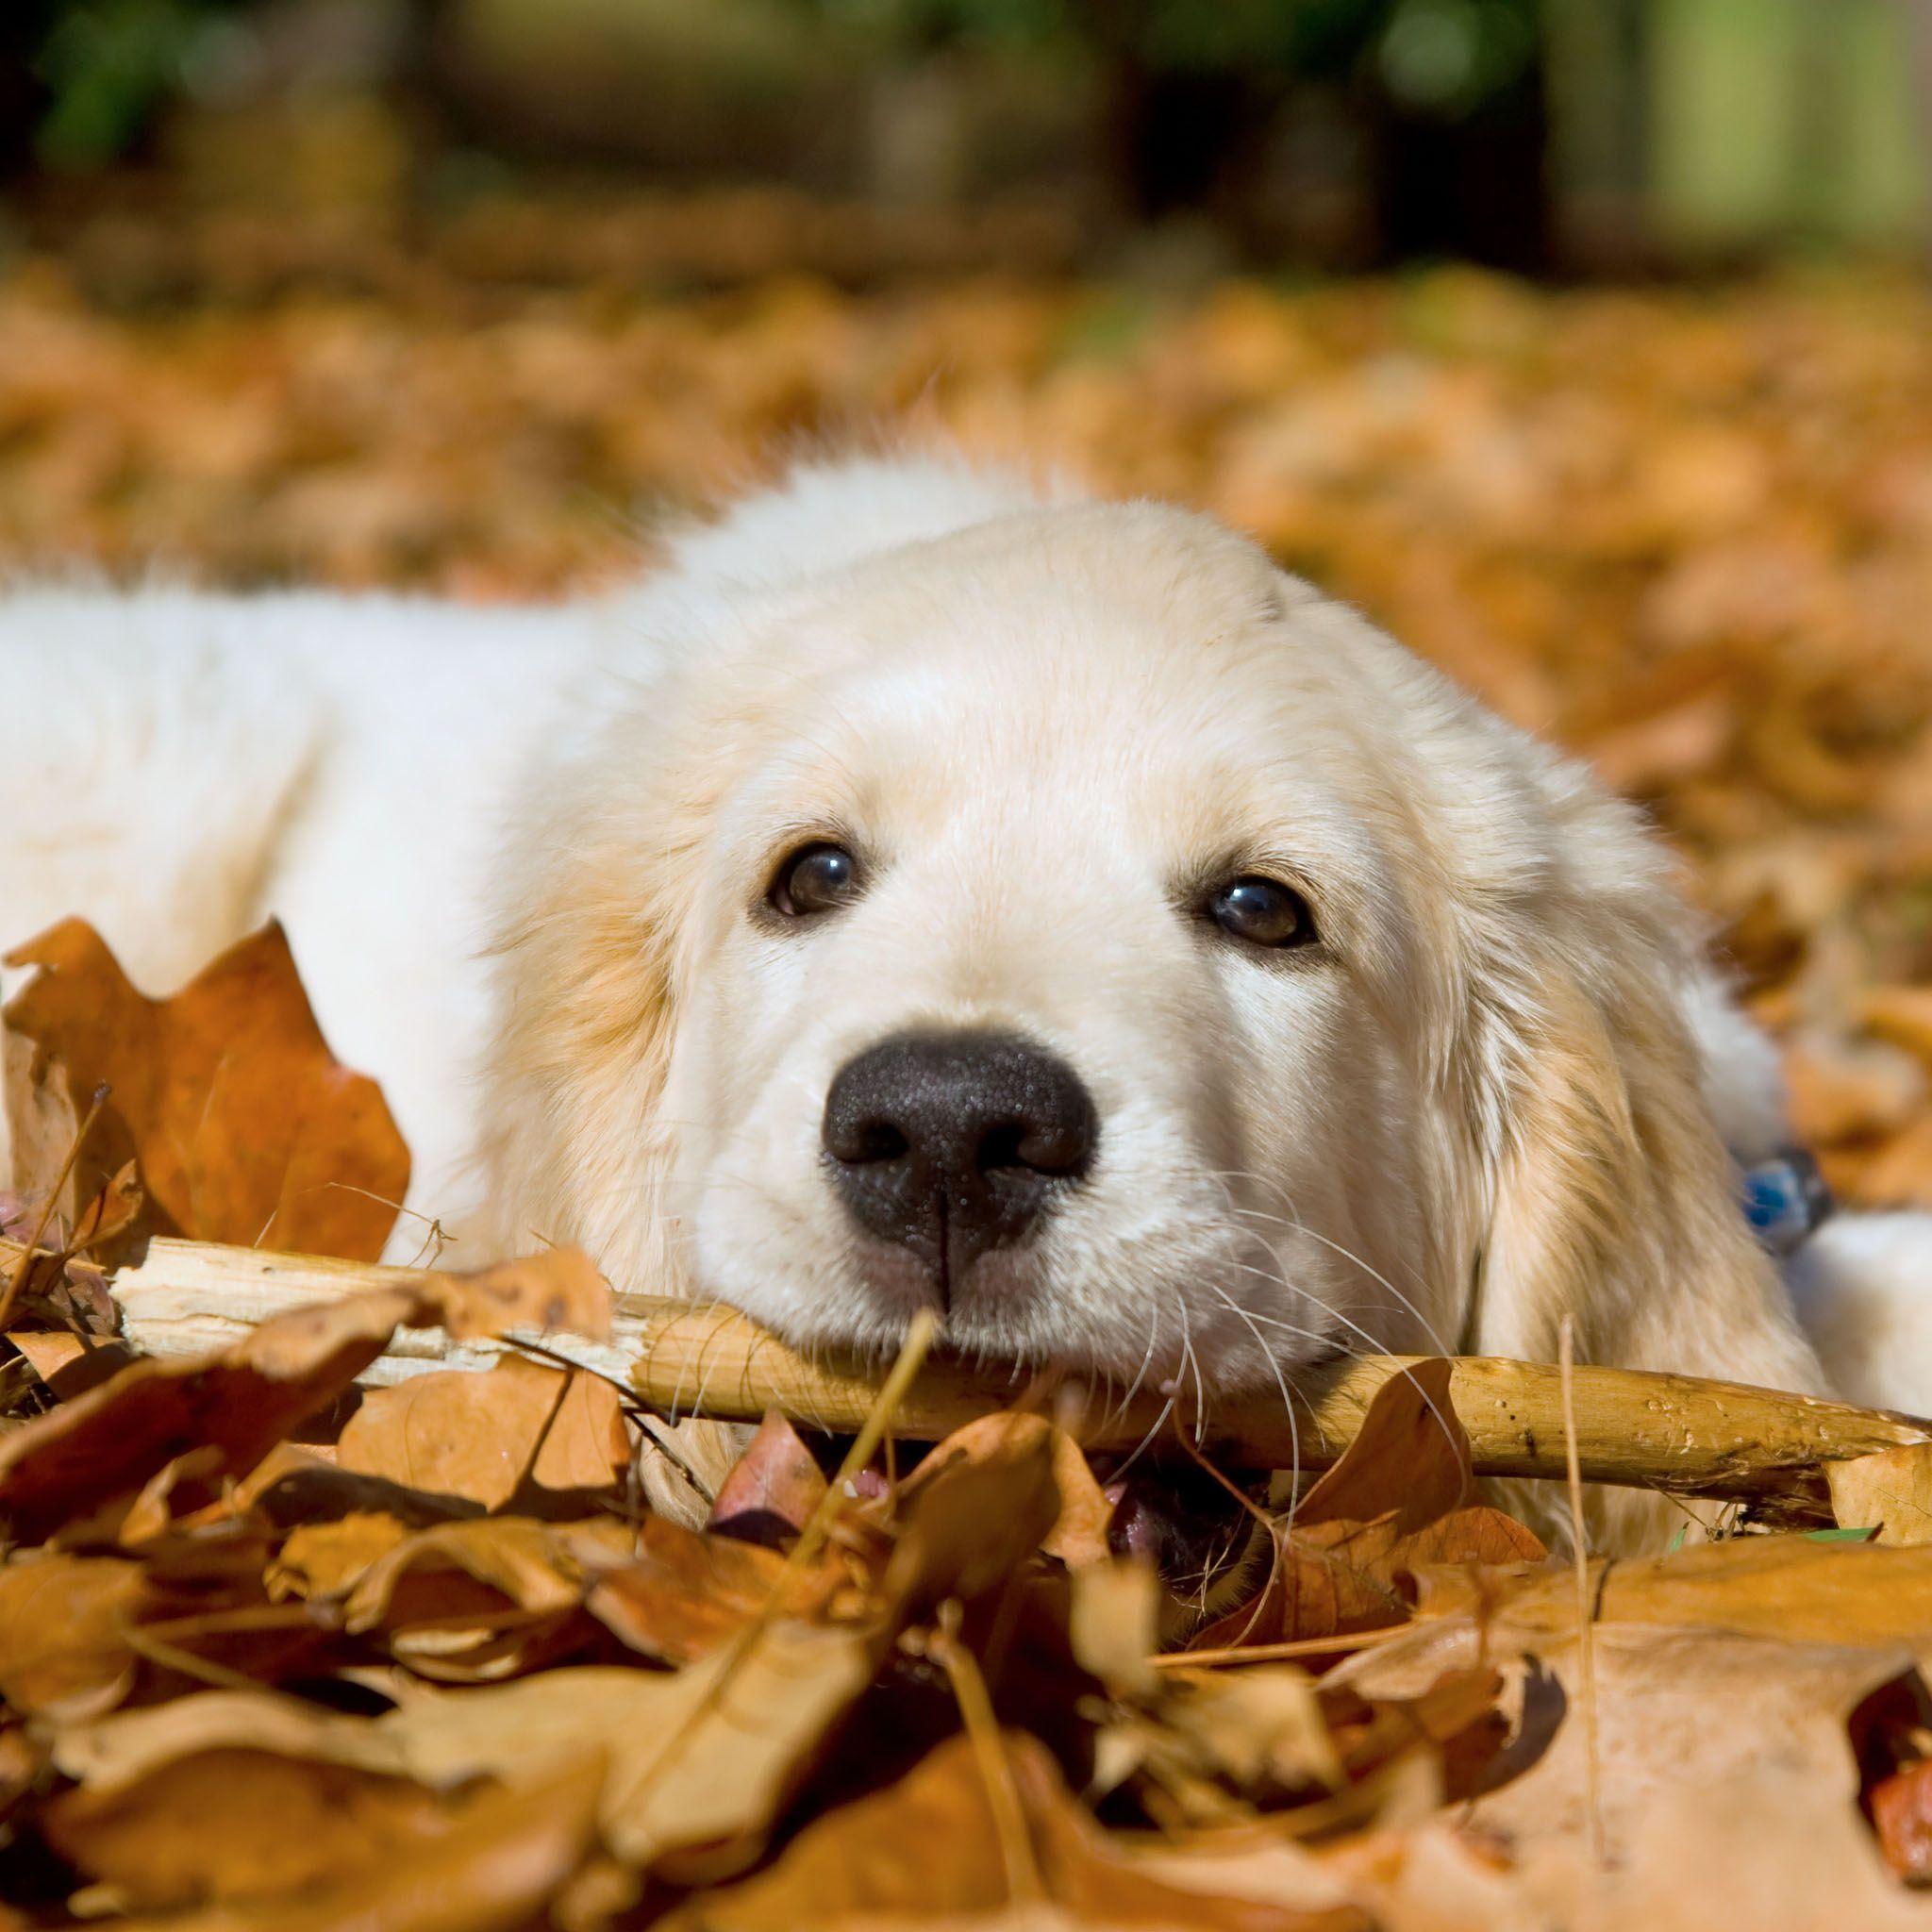 Puppies And Fall Wallpaper Golden Retriever Backgrounds Wallpaper Cave